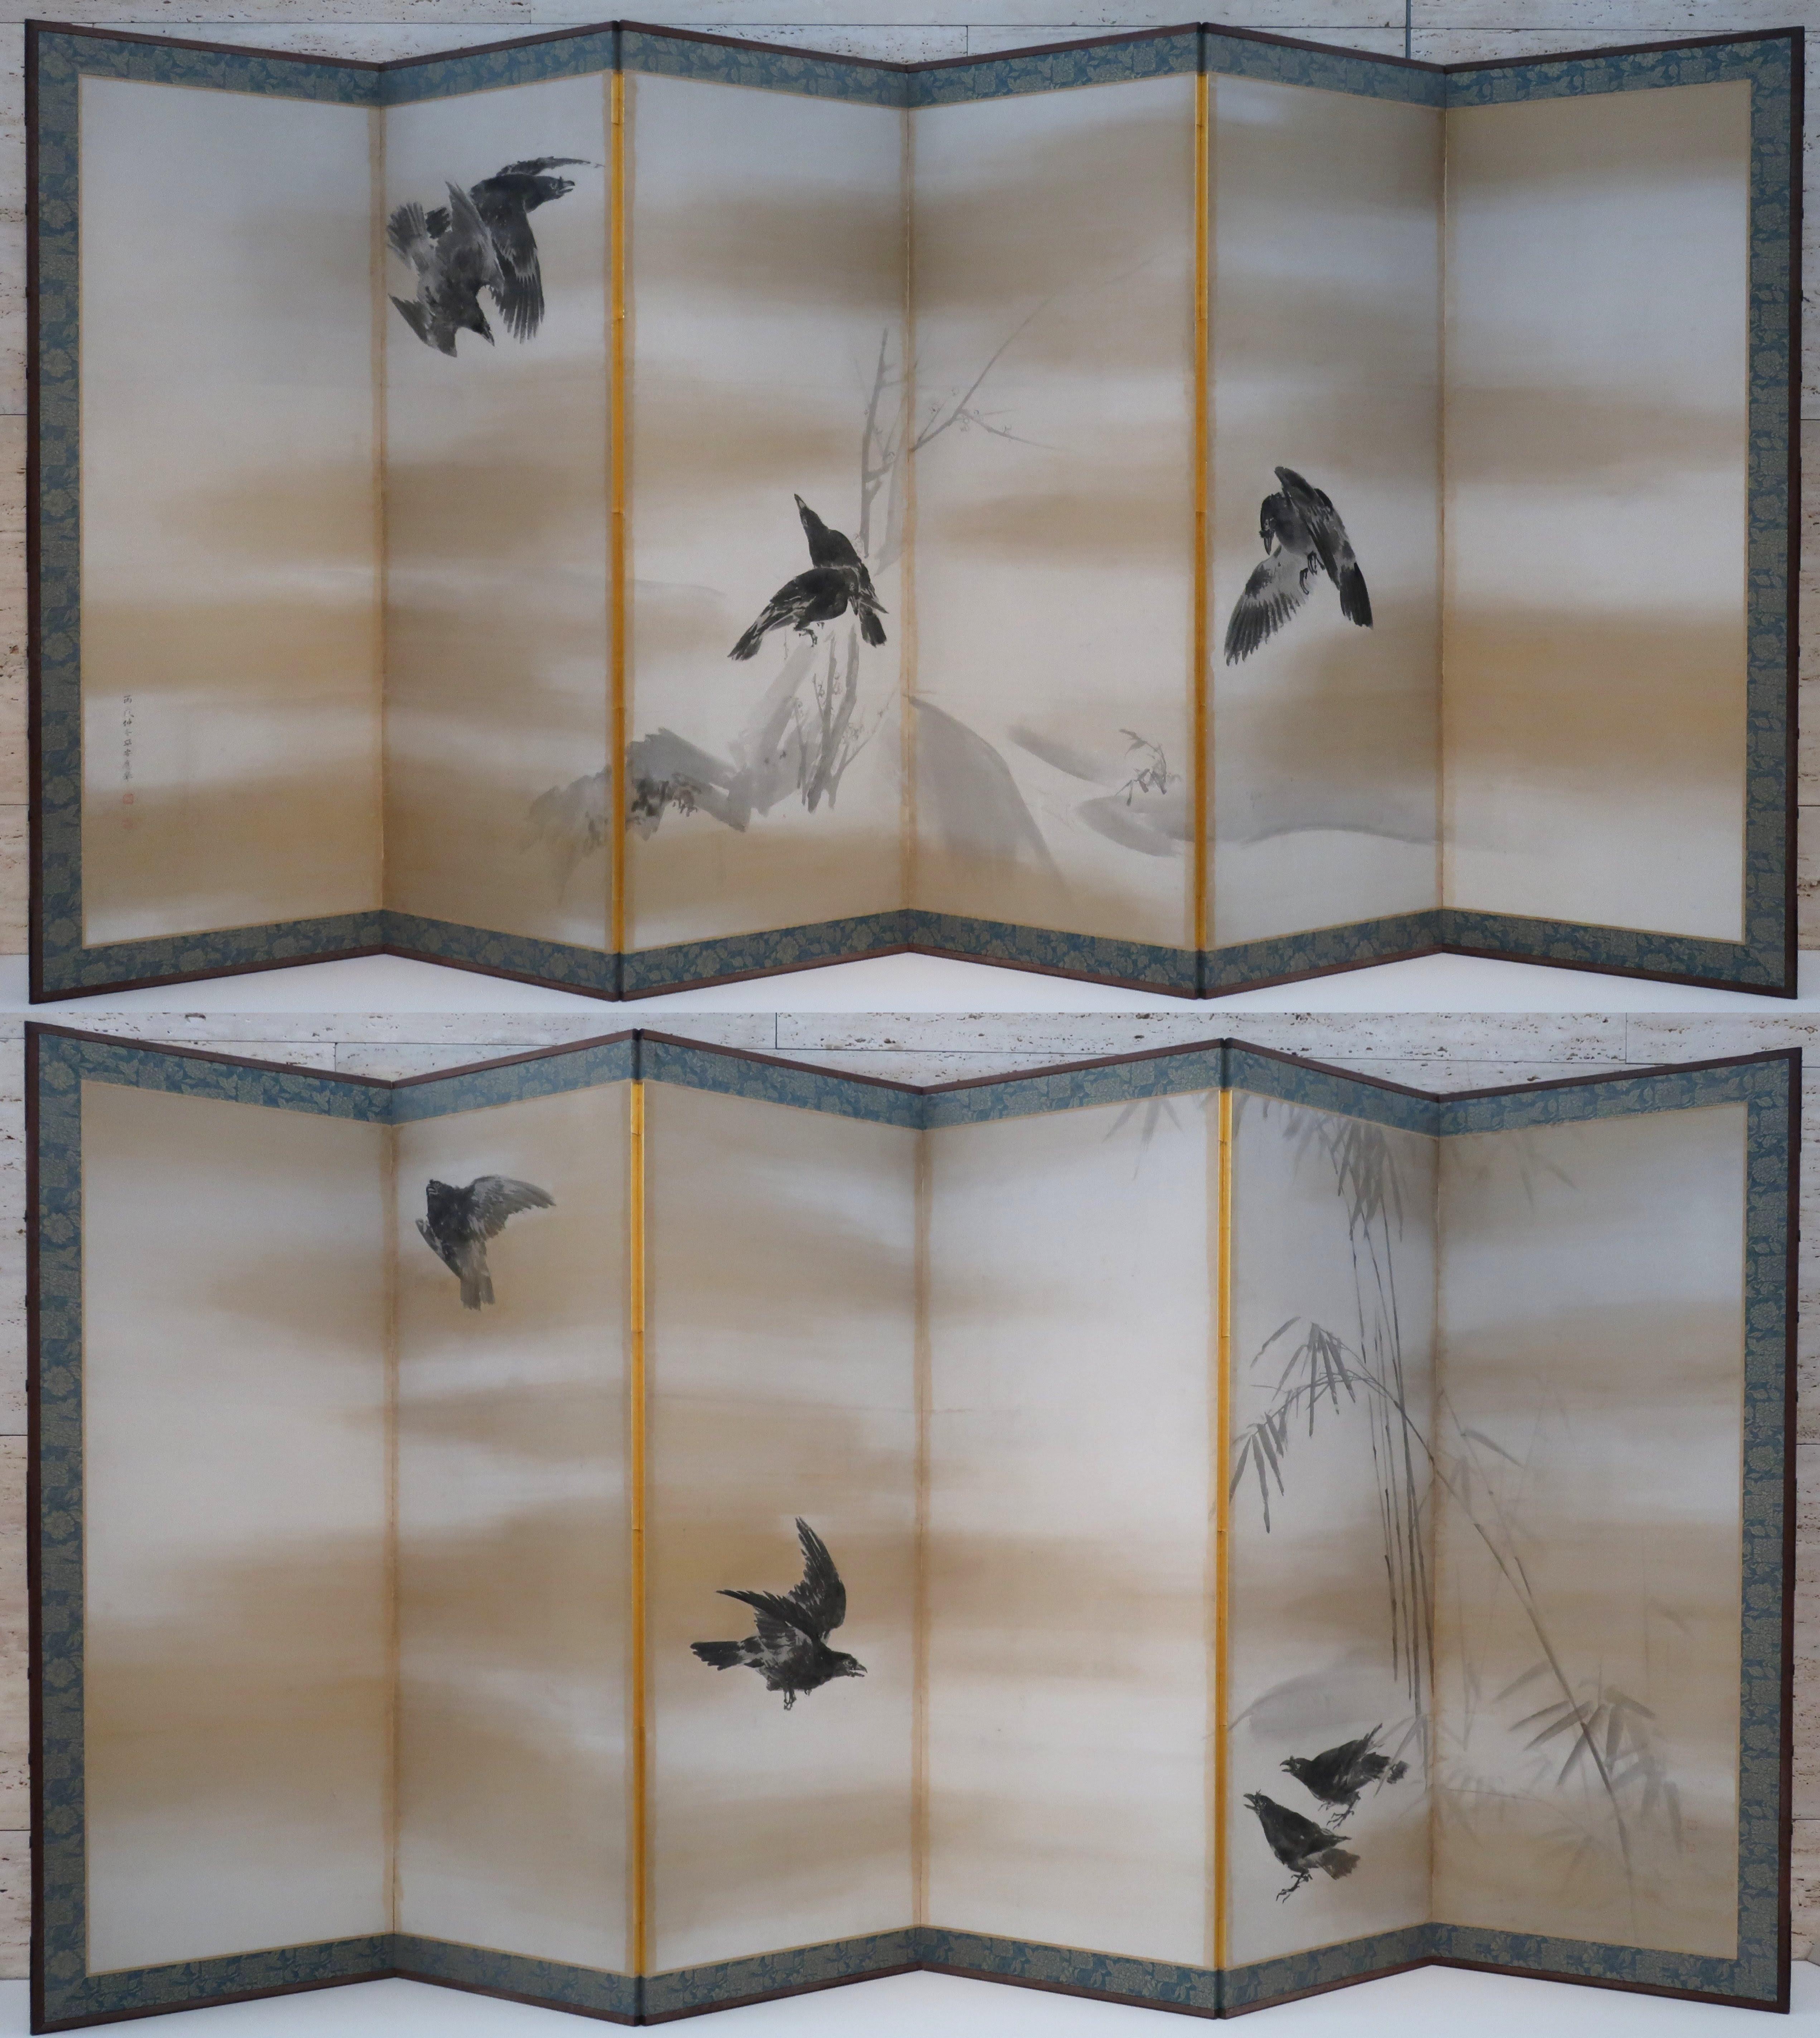 'Crows' by Maruyama Okyo